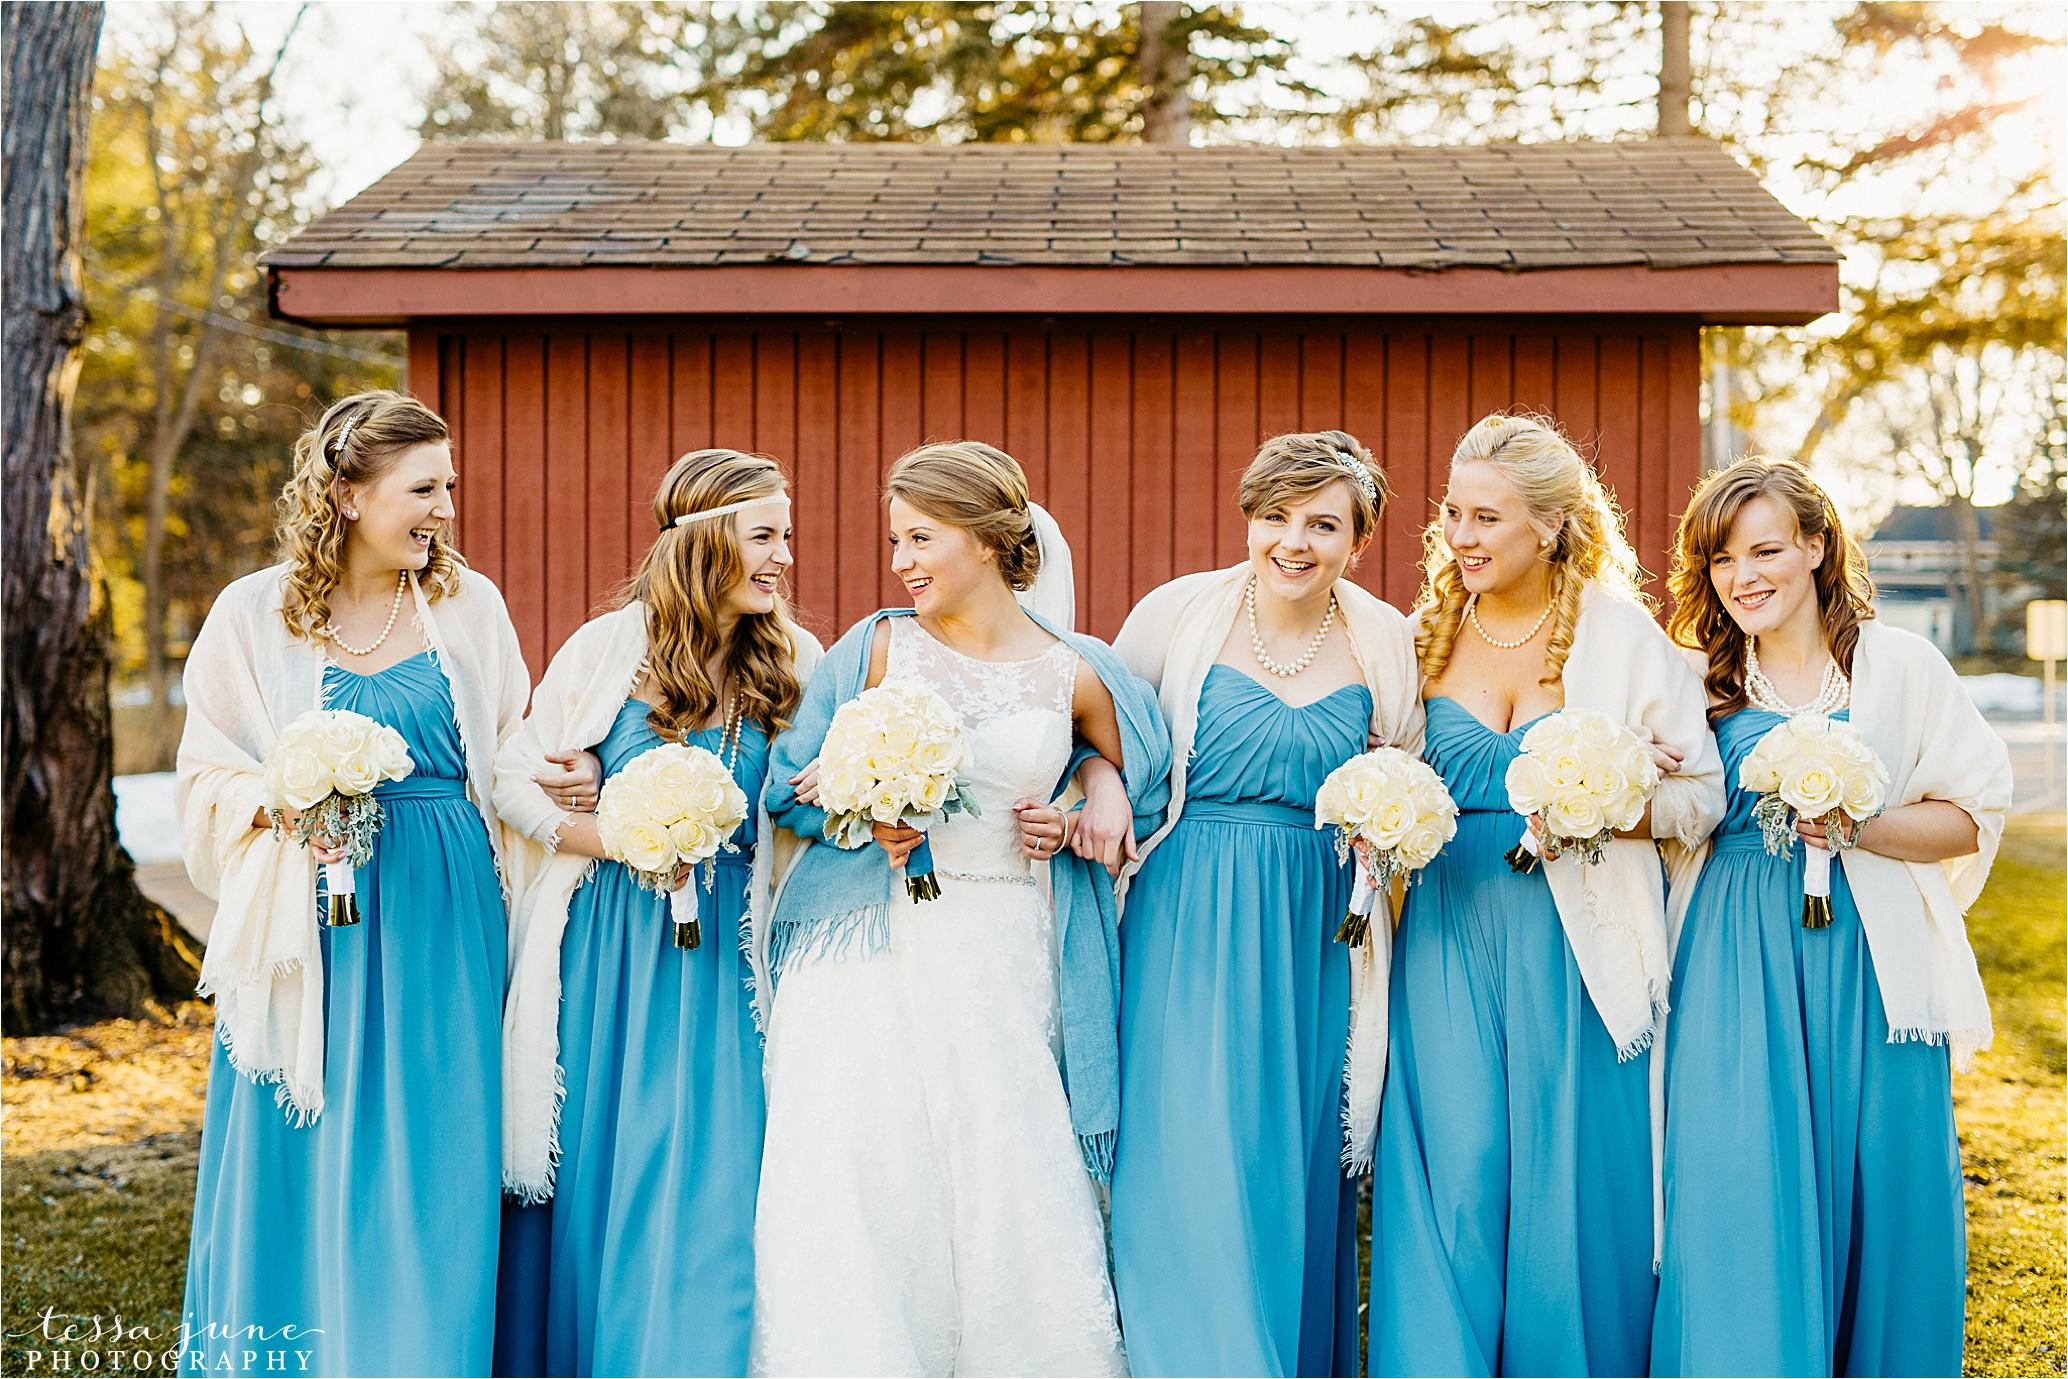 st-cloud-minnesota-wedding-photographer-brooklyn-park-community-center-bridesmaids-march